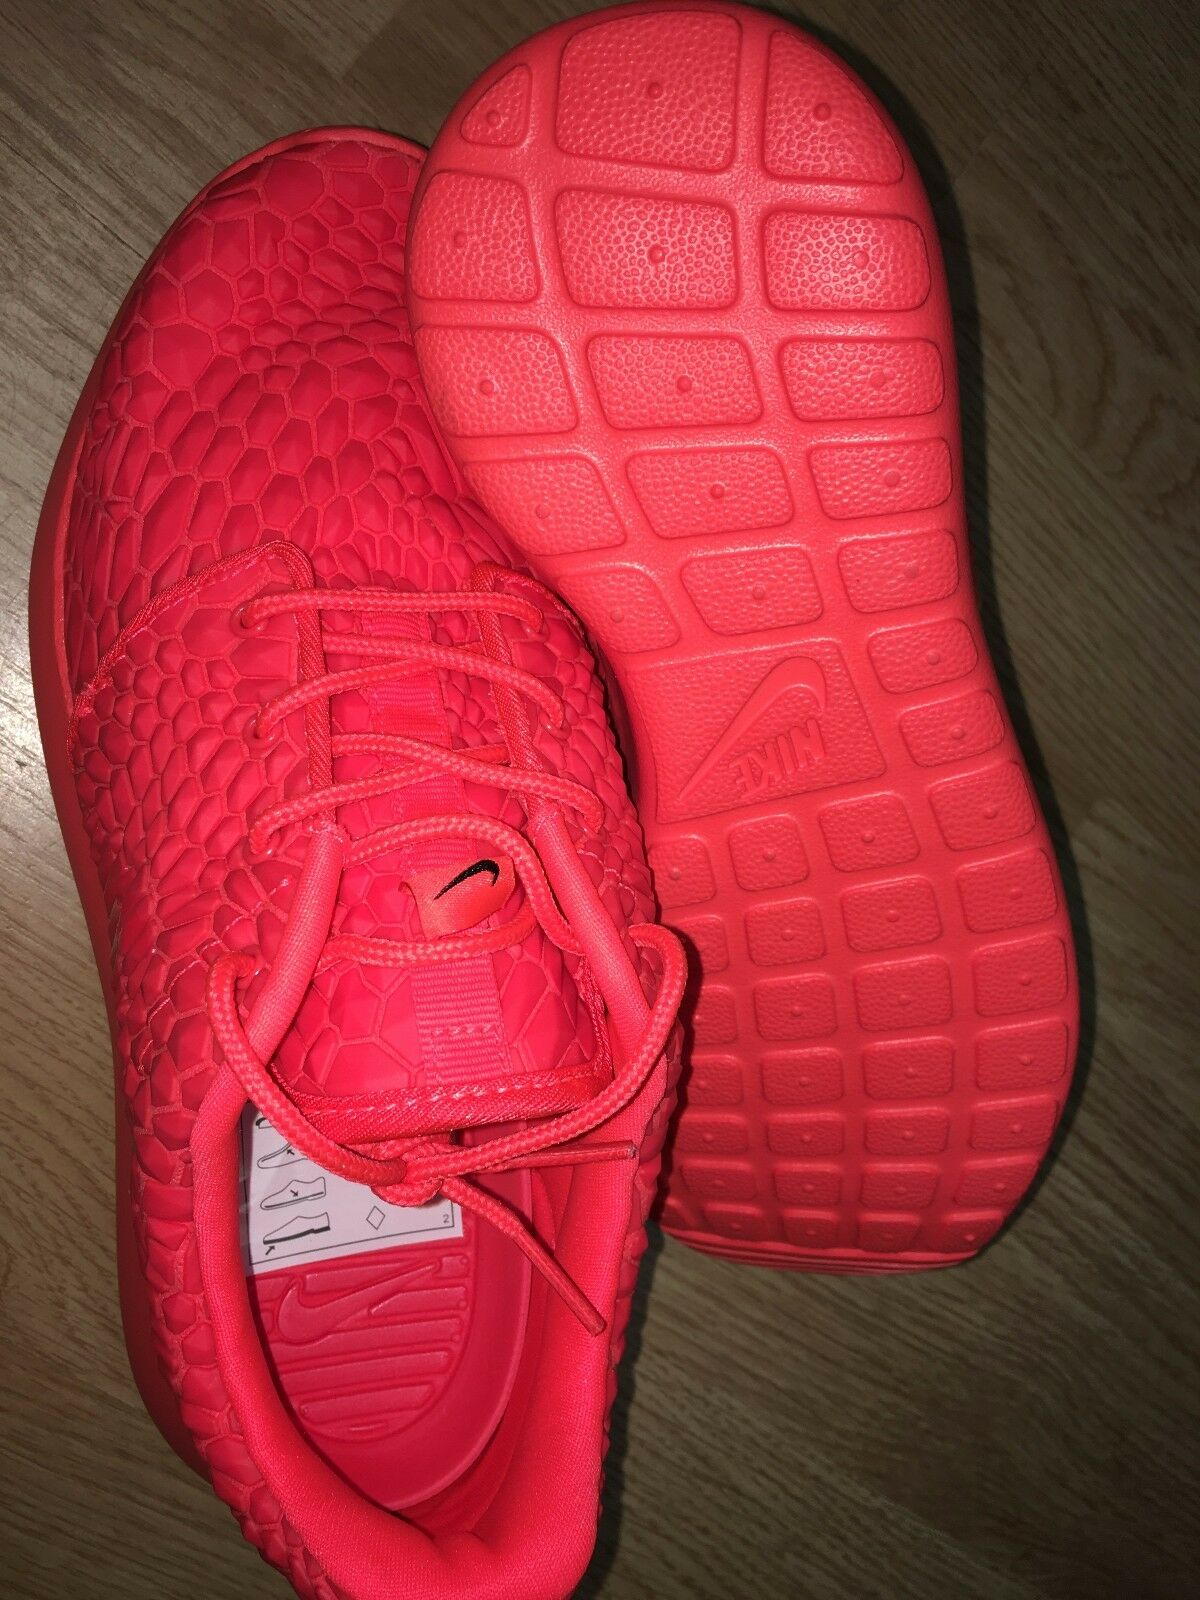 df3e1e5c9db2 ... Nike Roshe Roshe Roshe One DMB Bright Crimson Diamondback LTD 807460-600  Red Rare 480fb7 ...